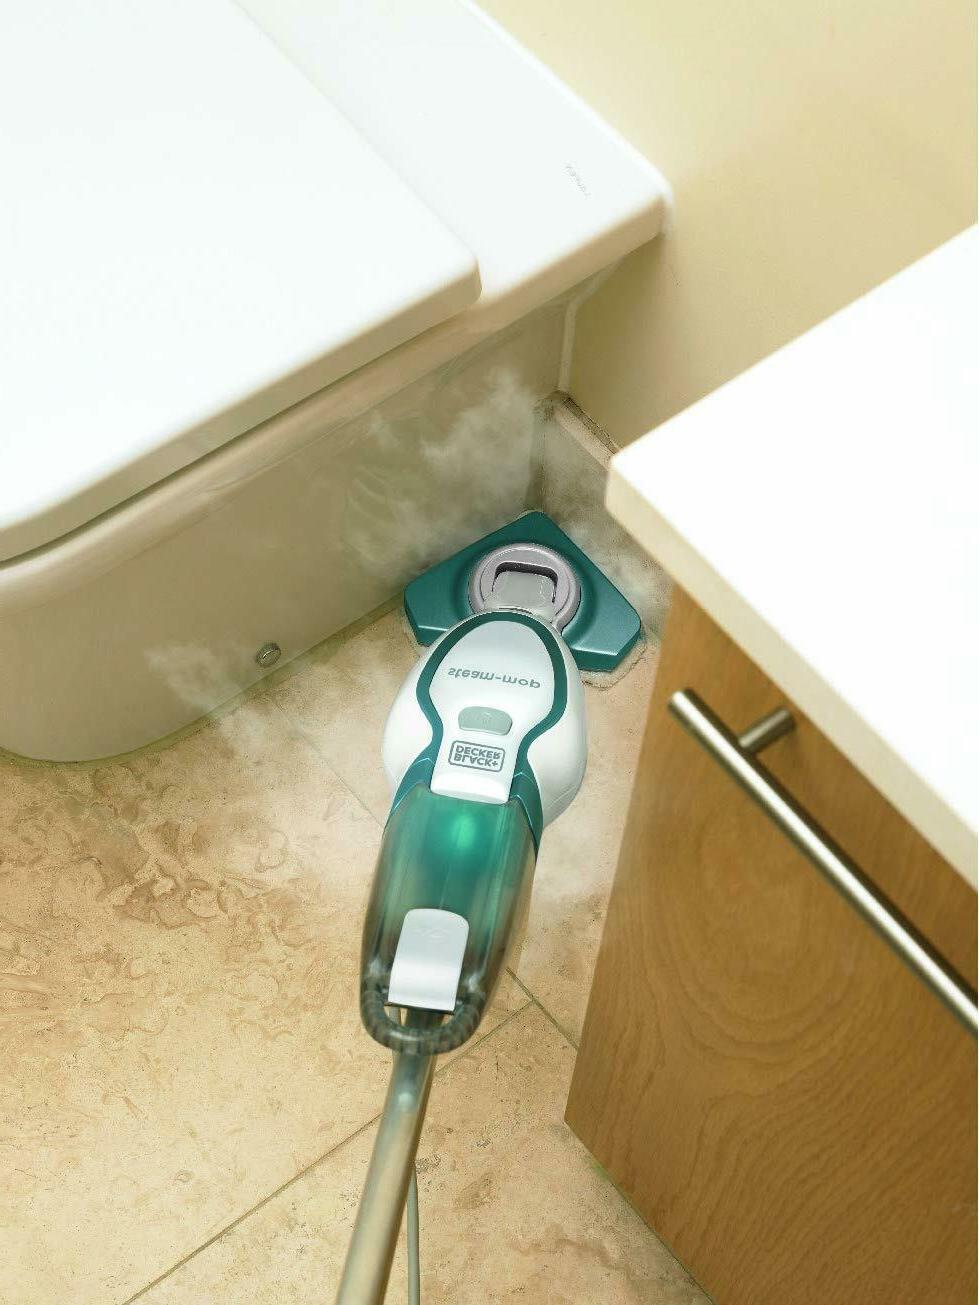 Head Mop FSM1616 220 VOLTS USE ONLY